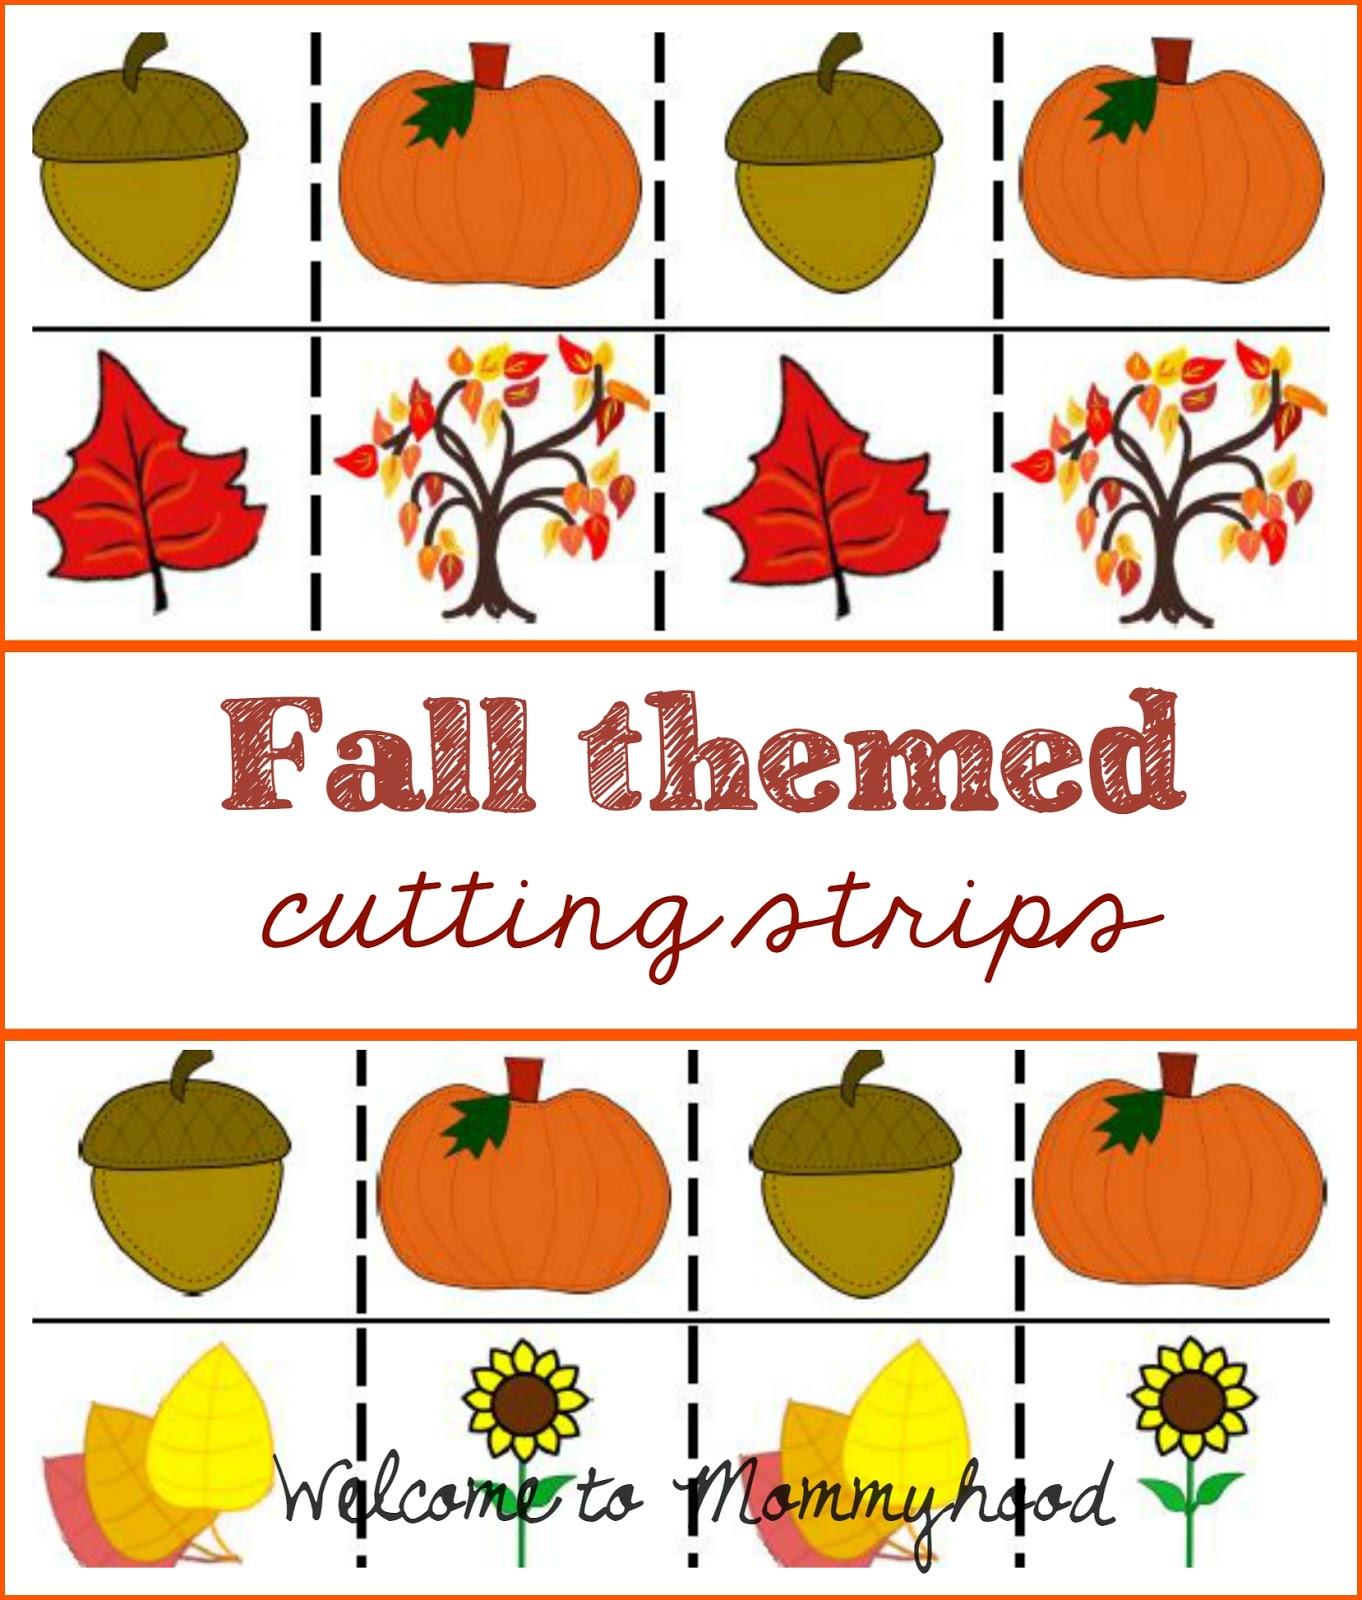 Fall Themed Cutting Strips